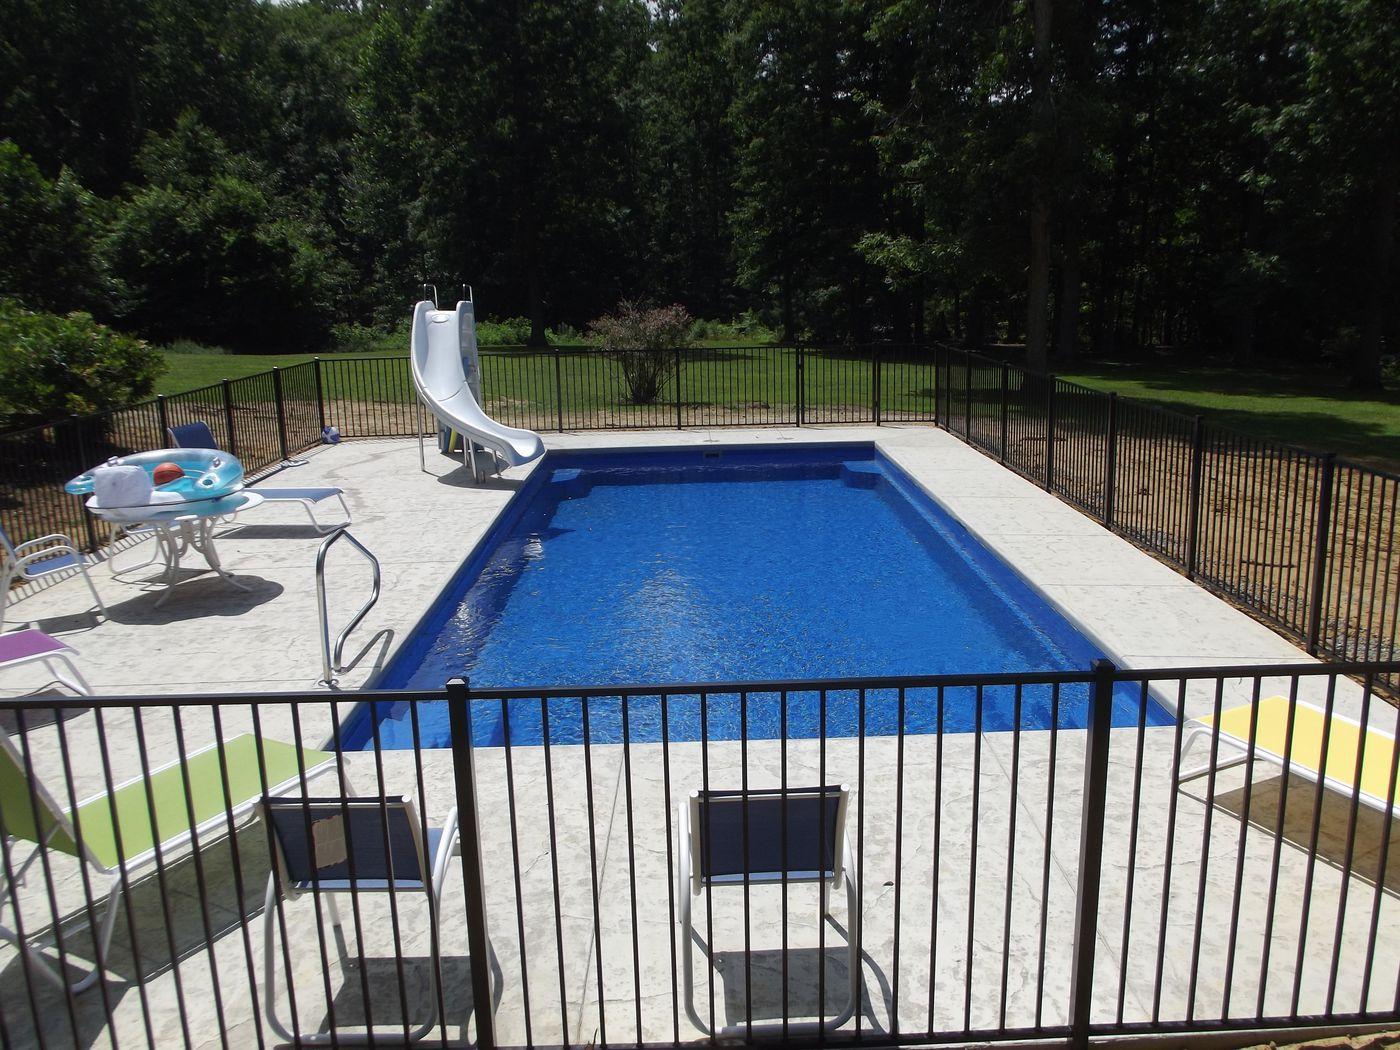 Deep are fiberglass pools how deep are fiberglass pools solutioingenieria Choice Image